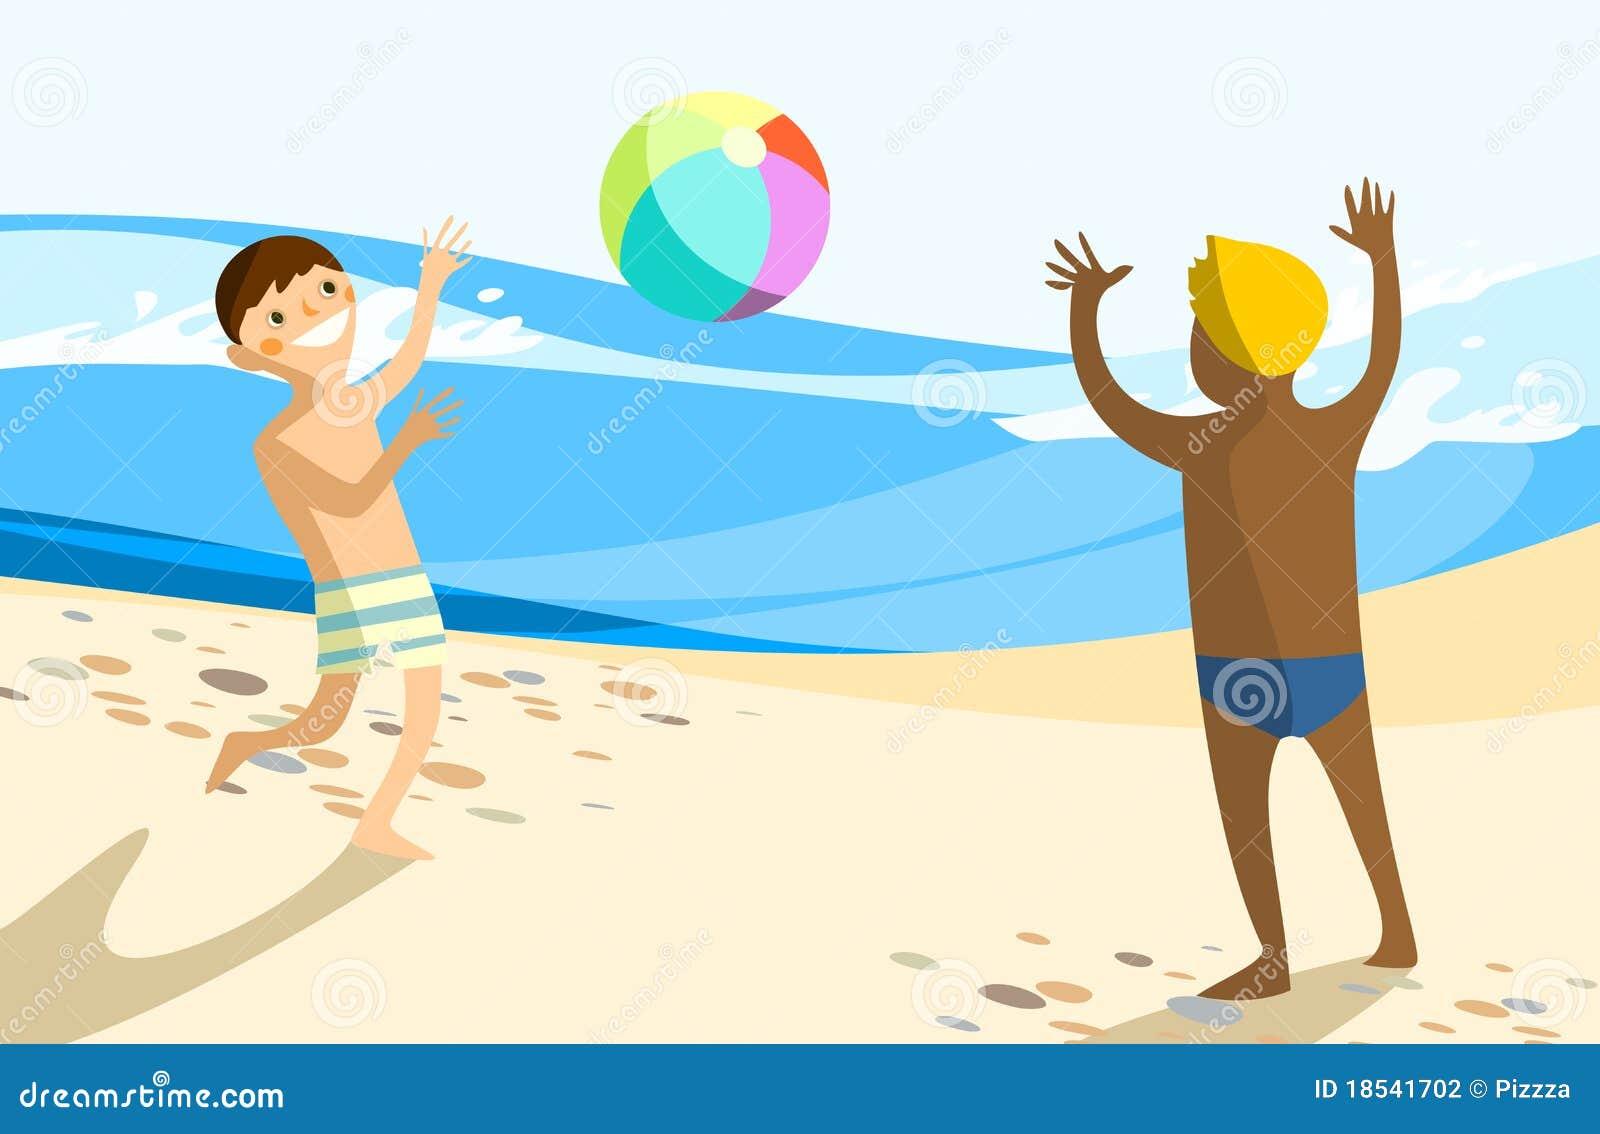 Cartoon Kids Sand Play